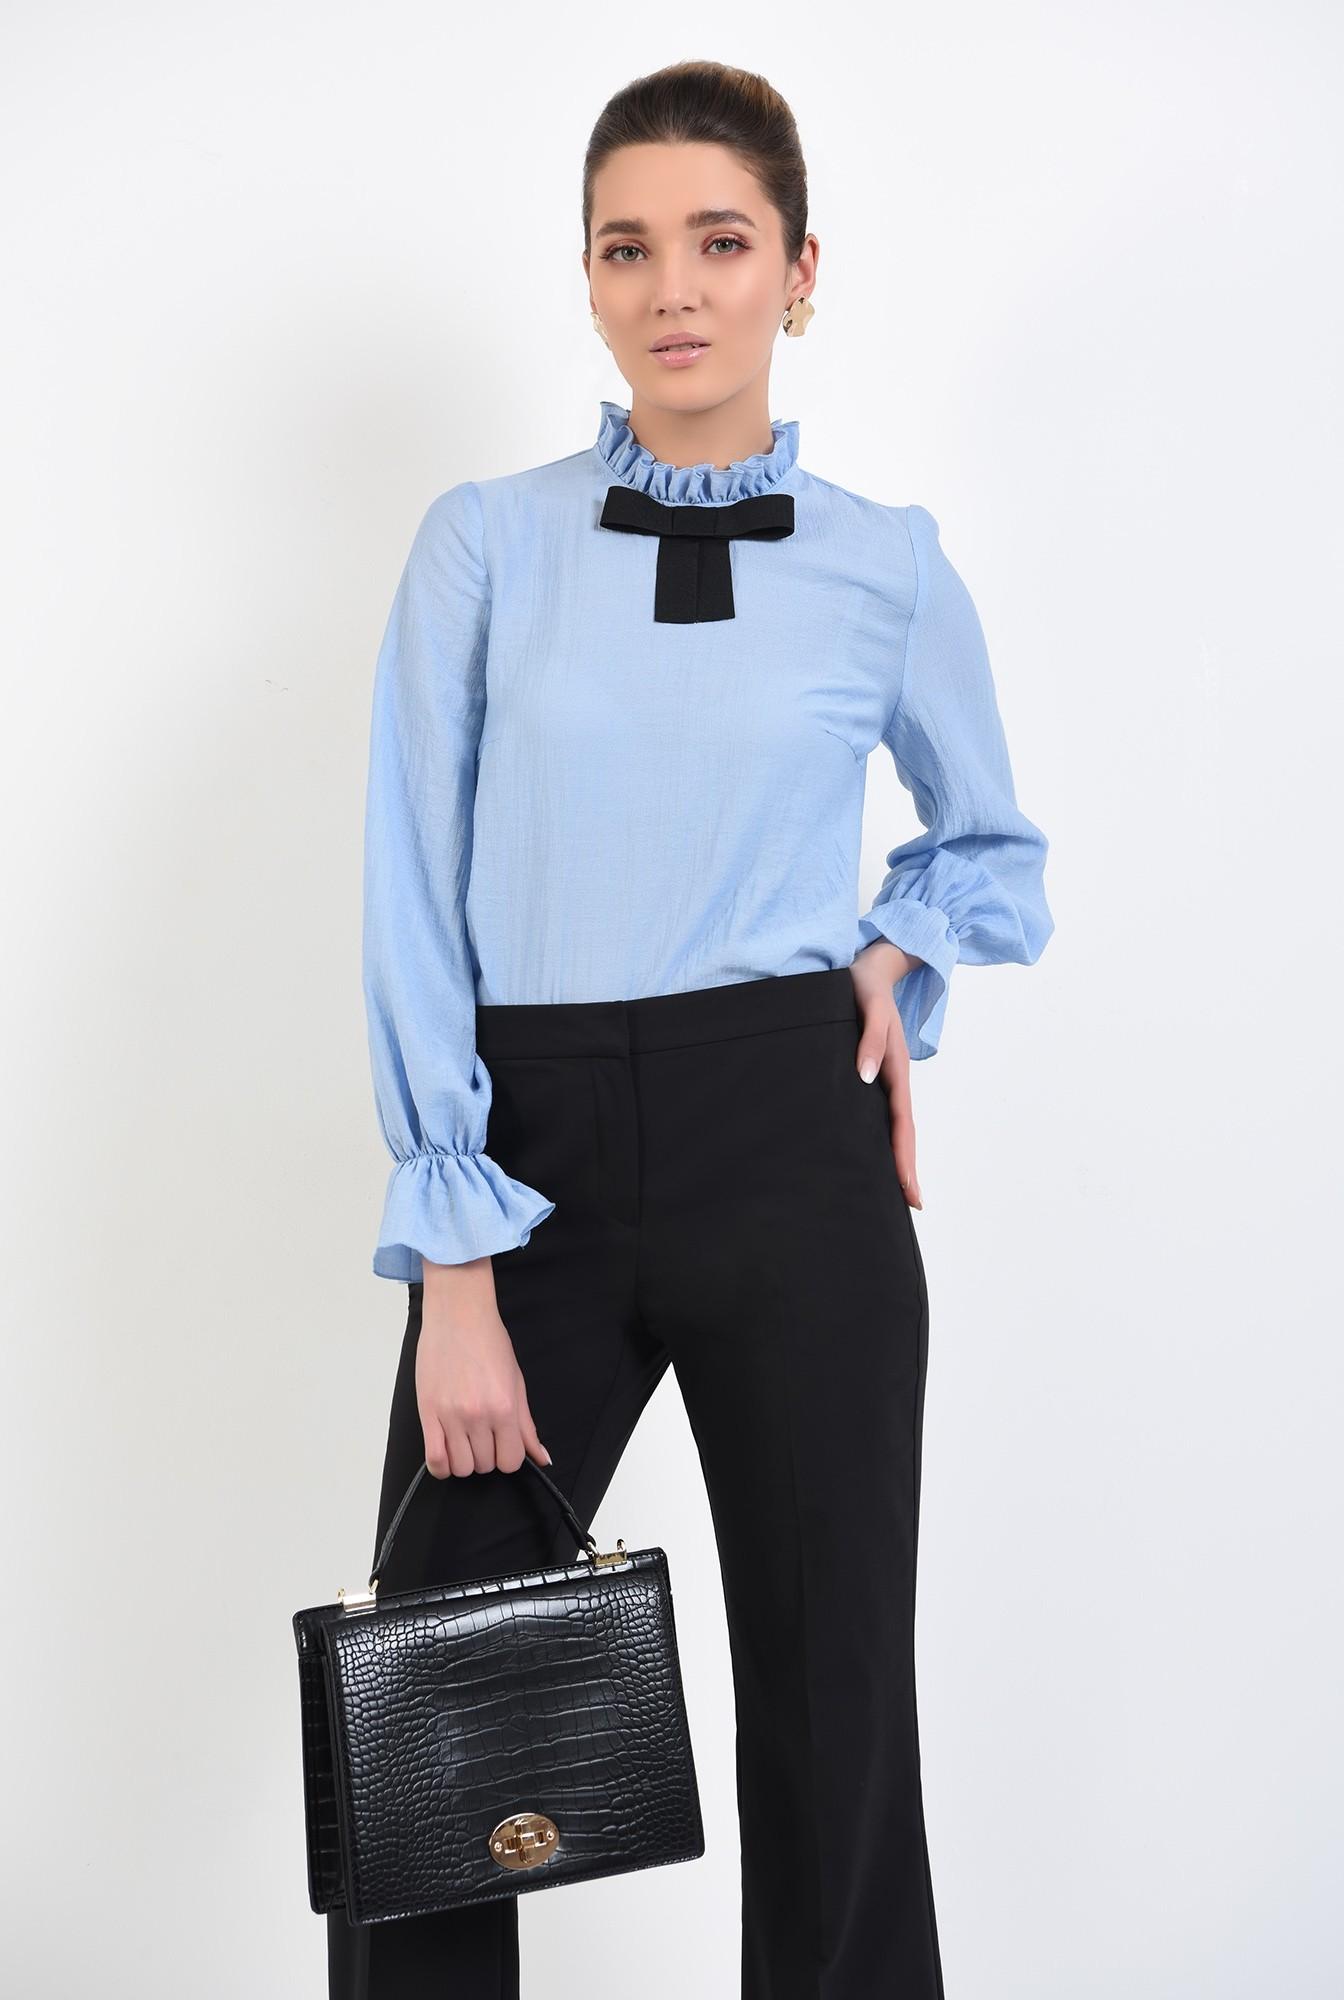 0 - bluza office, bleu, cu funda, mansete volan, guler incretit